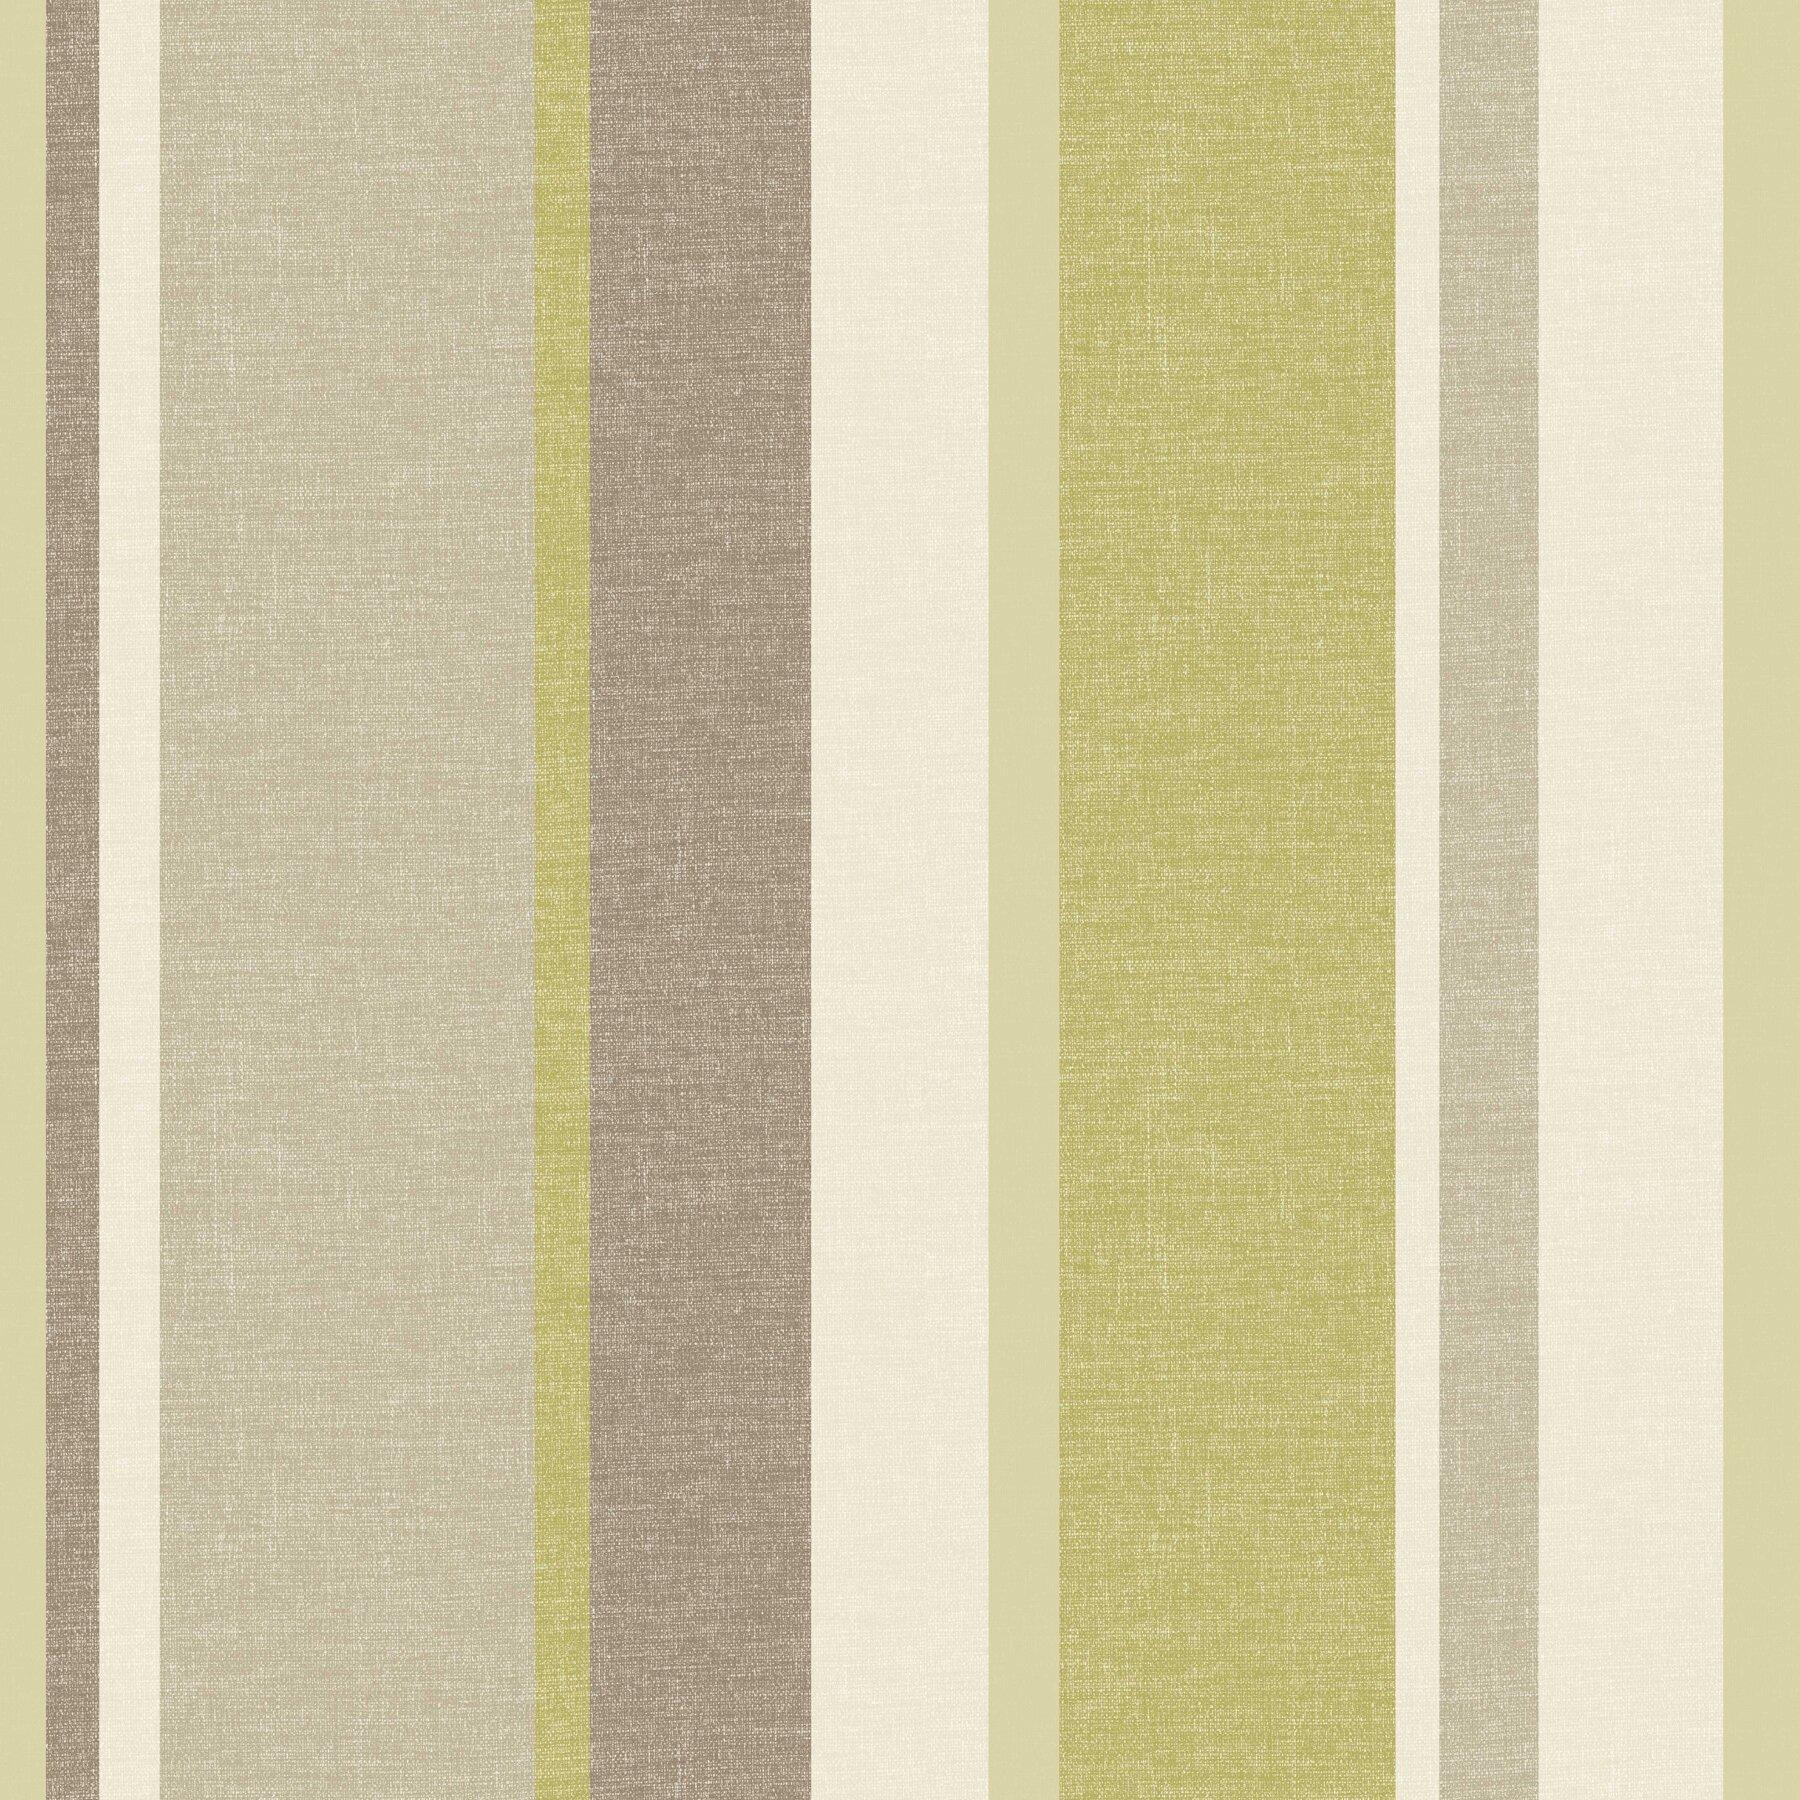 Brewster home fashions bath bath bath volume iv keene for 3d embossed wallpaper